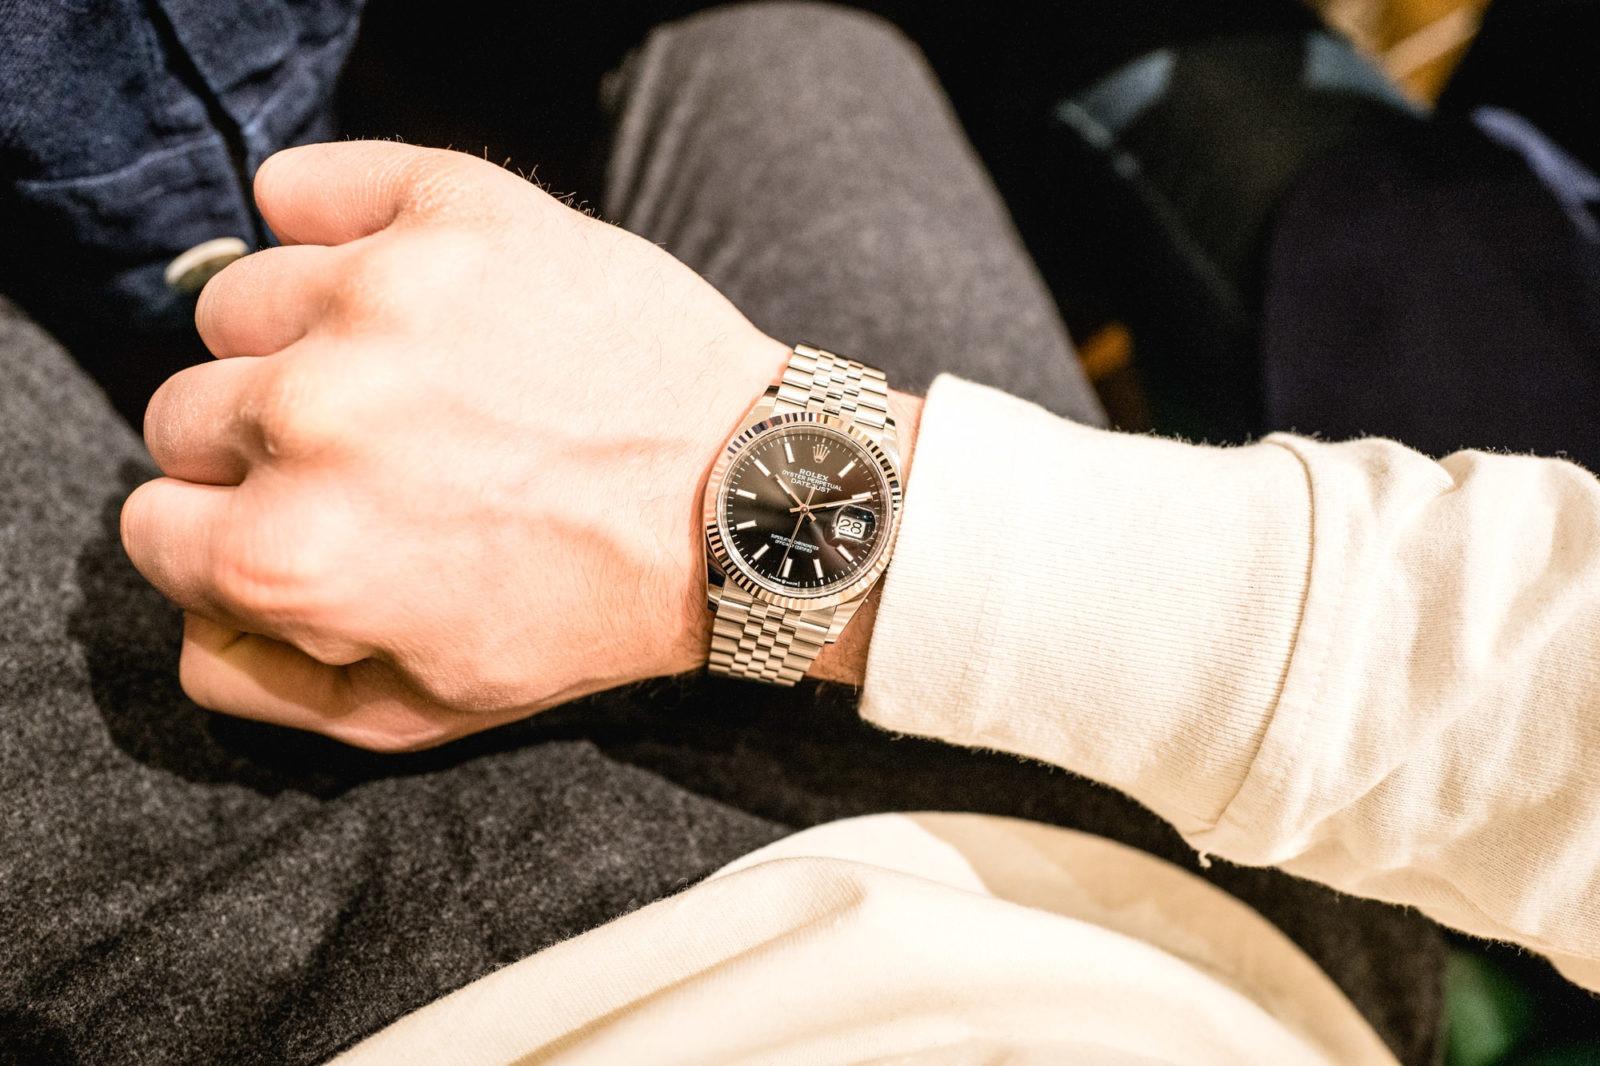 Rolex Datejust 36 - Baselworld 2019